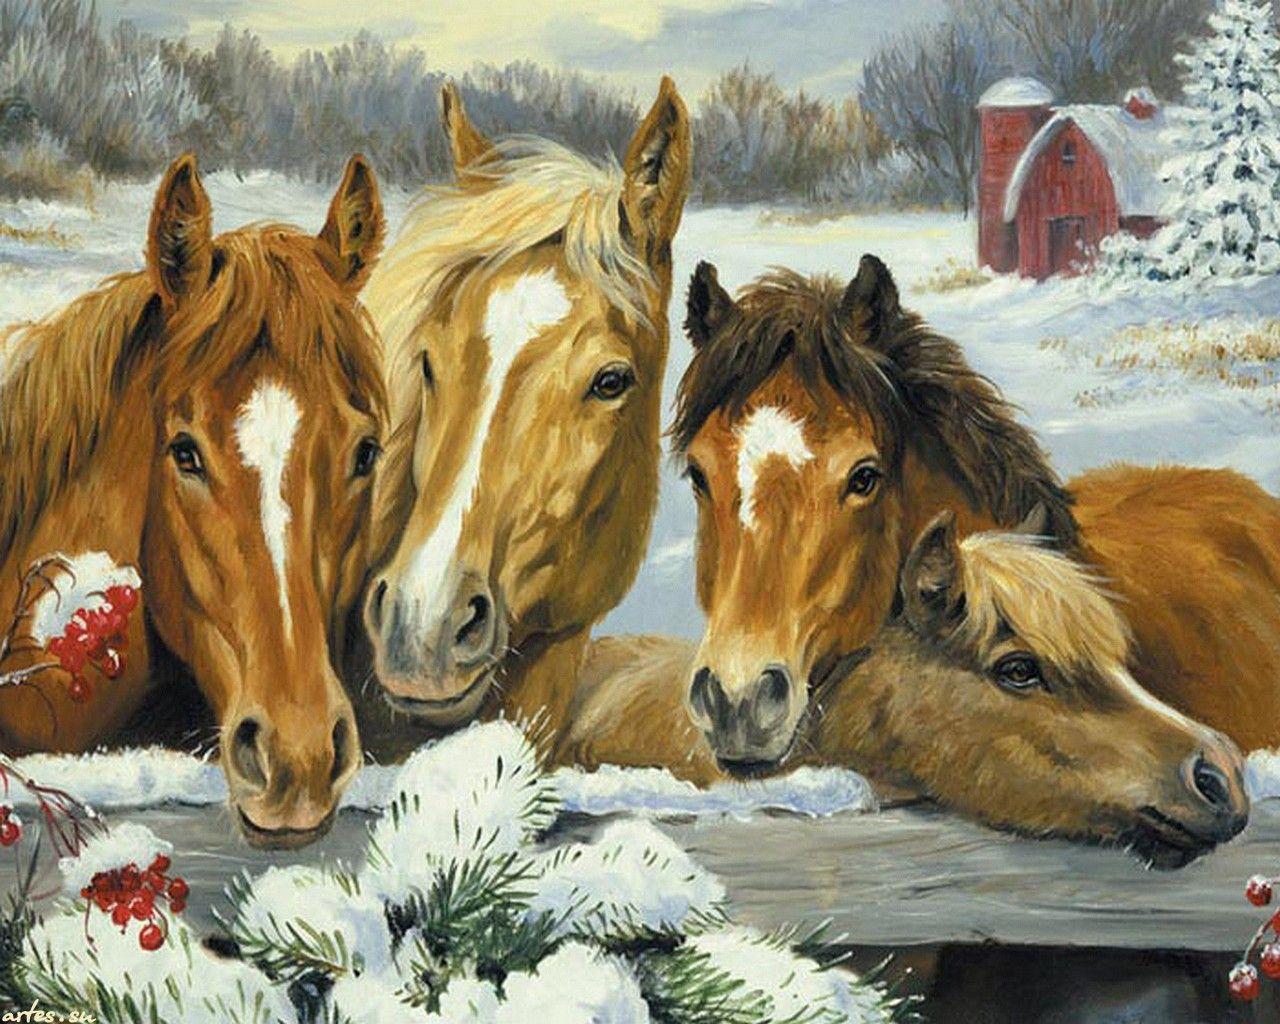 Fantastic Wallpaper Horse Family - b74941ce4824c97f0ed14817c84f6513  Best Photo Reference_487795.jpg